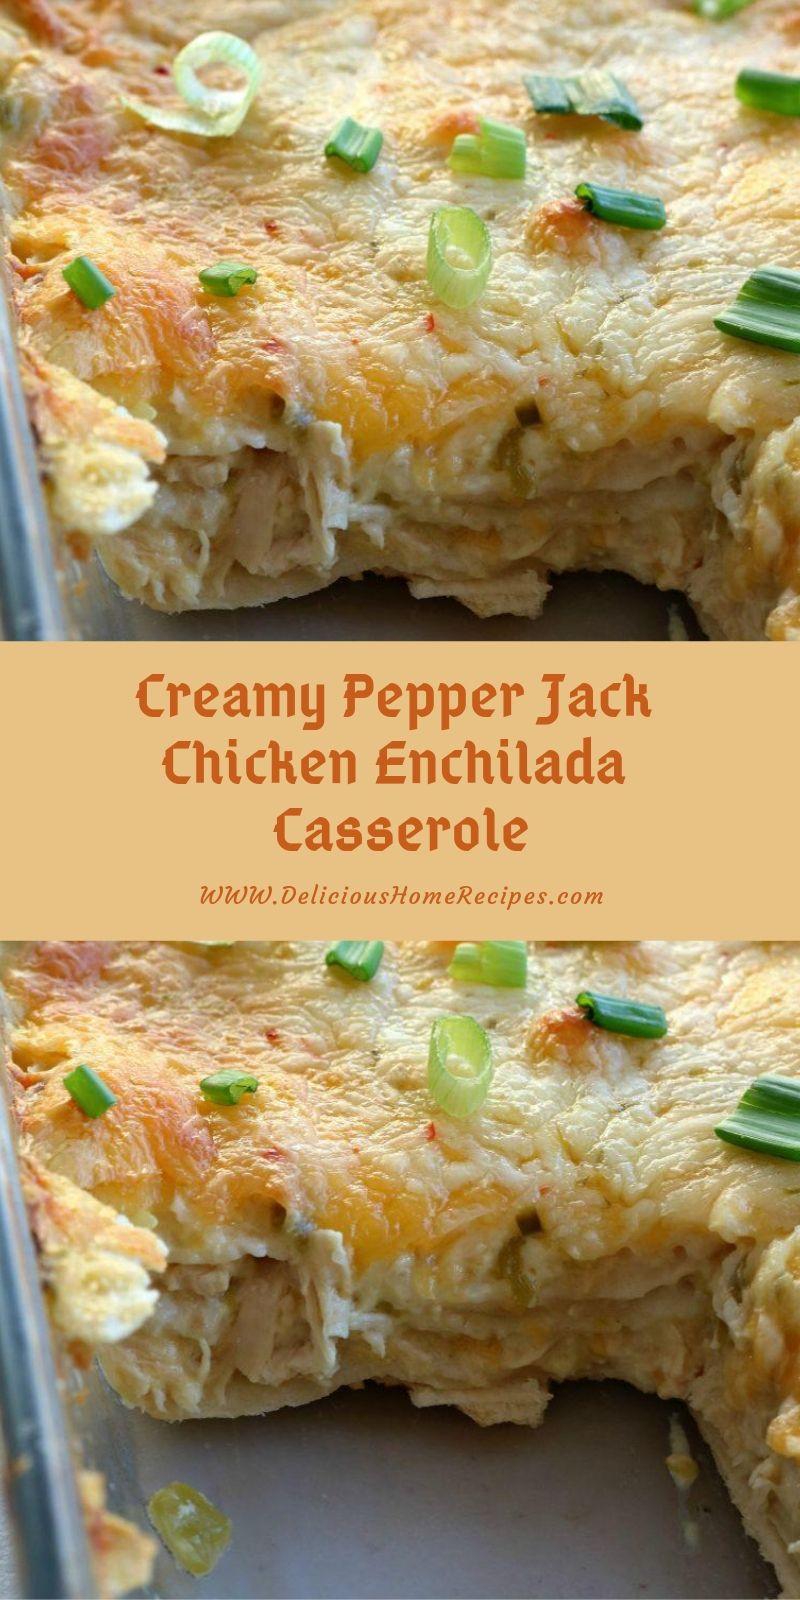 Creamy Pepper Jack Chicken Enchilada Casserole images